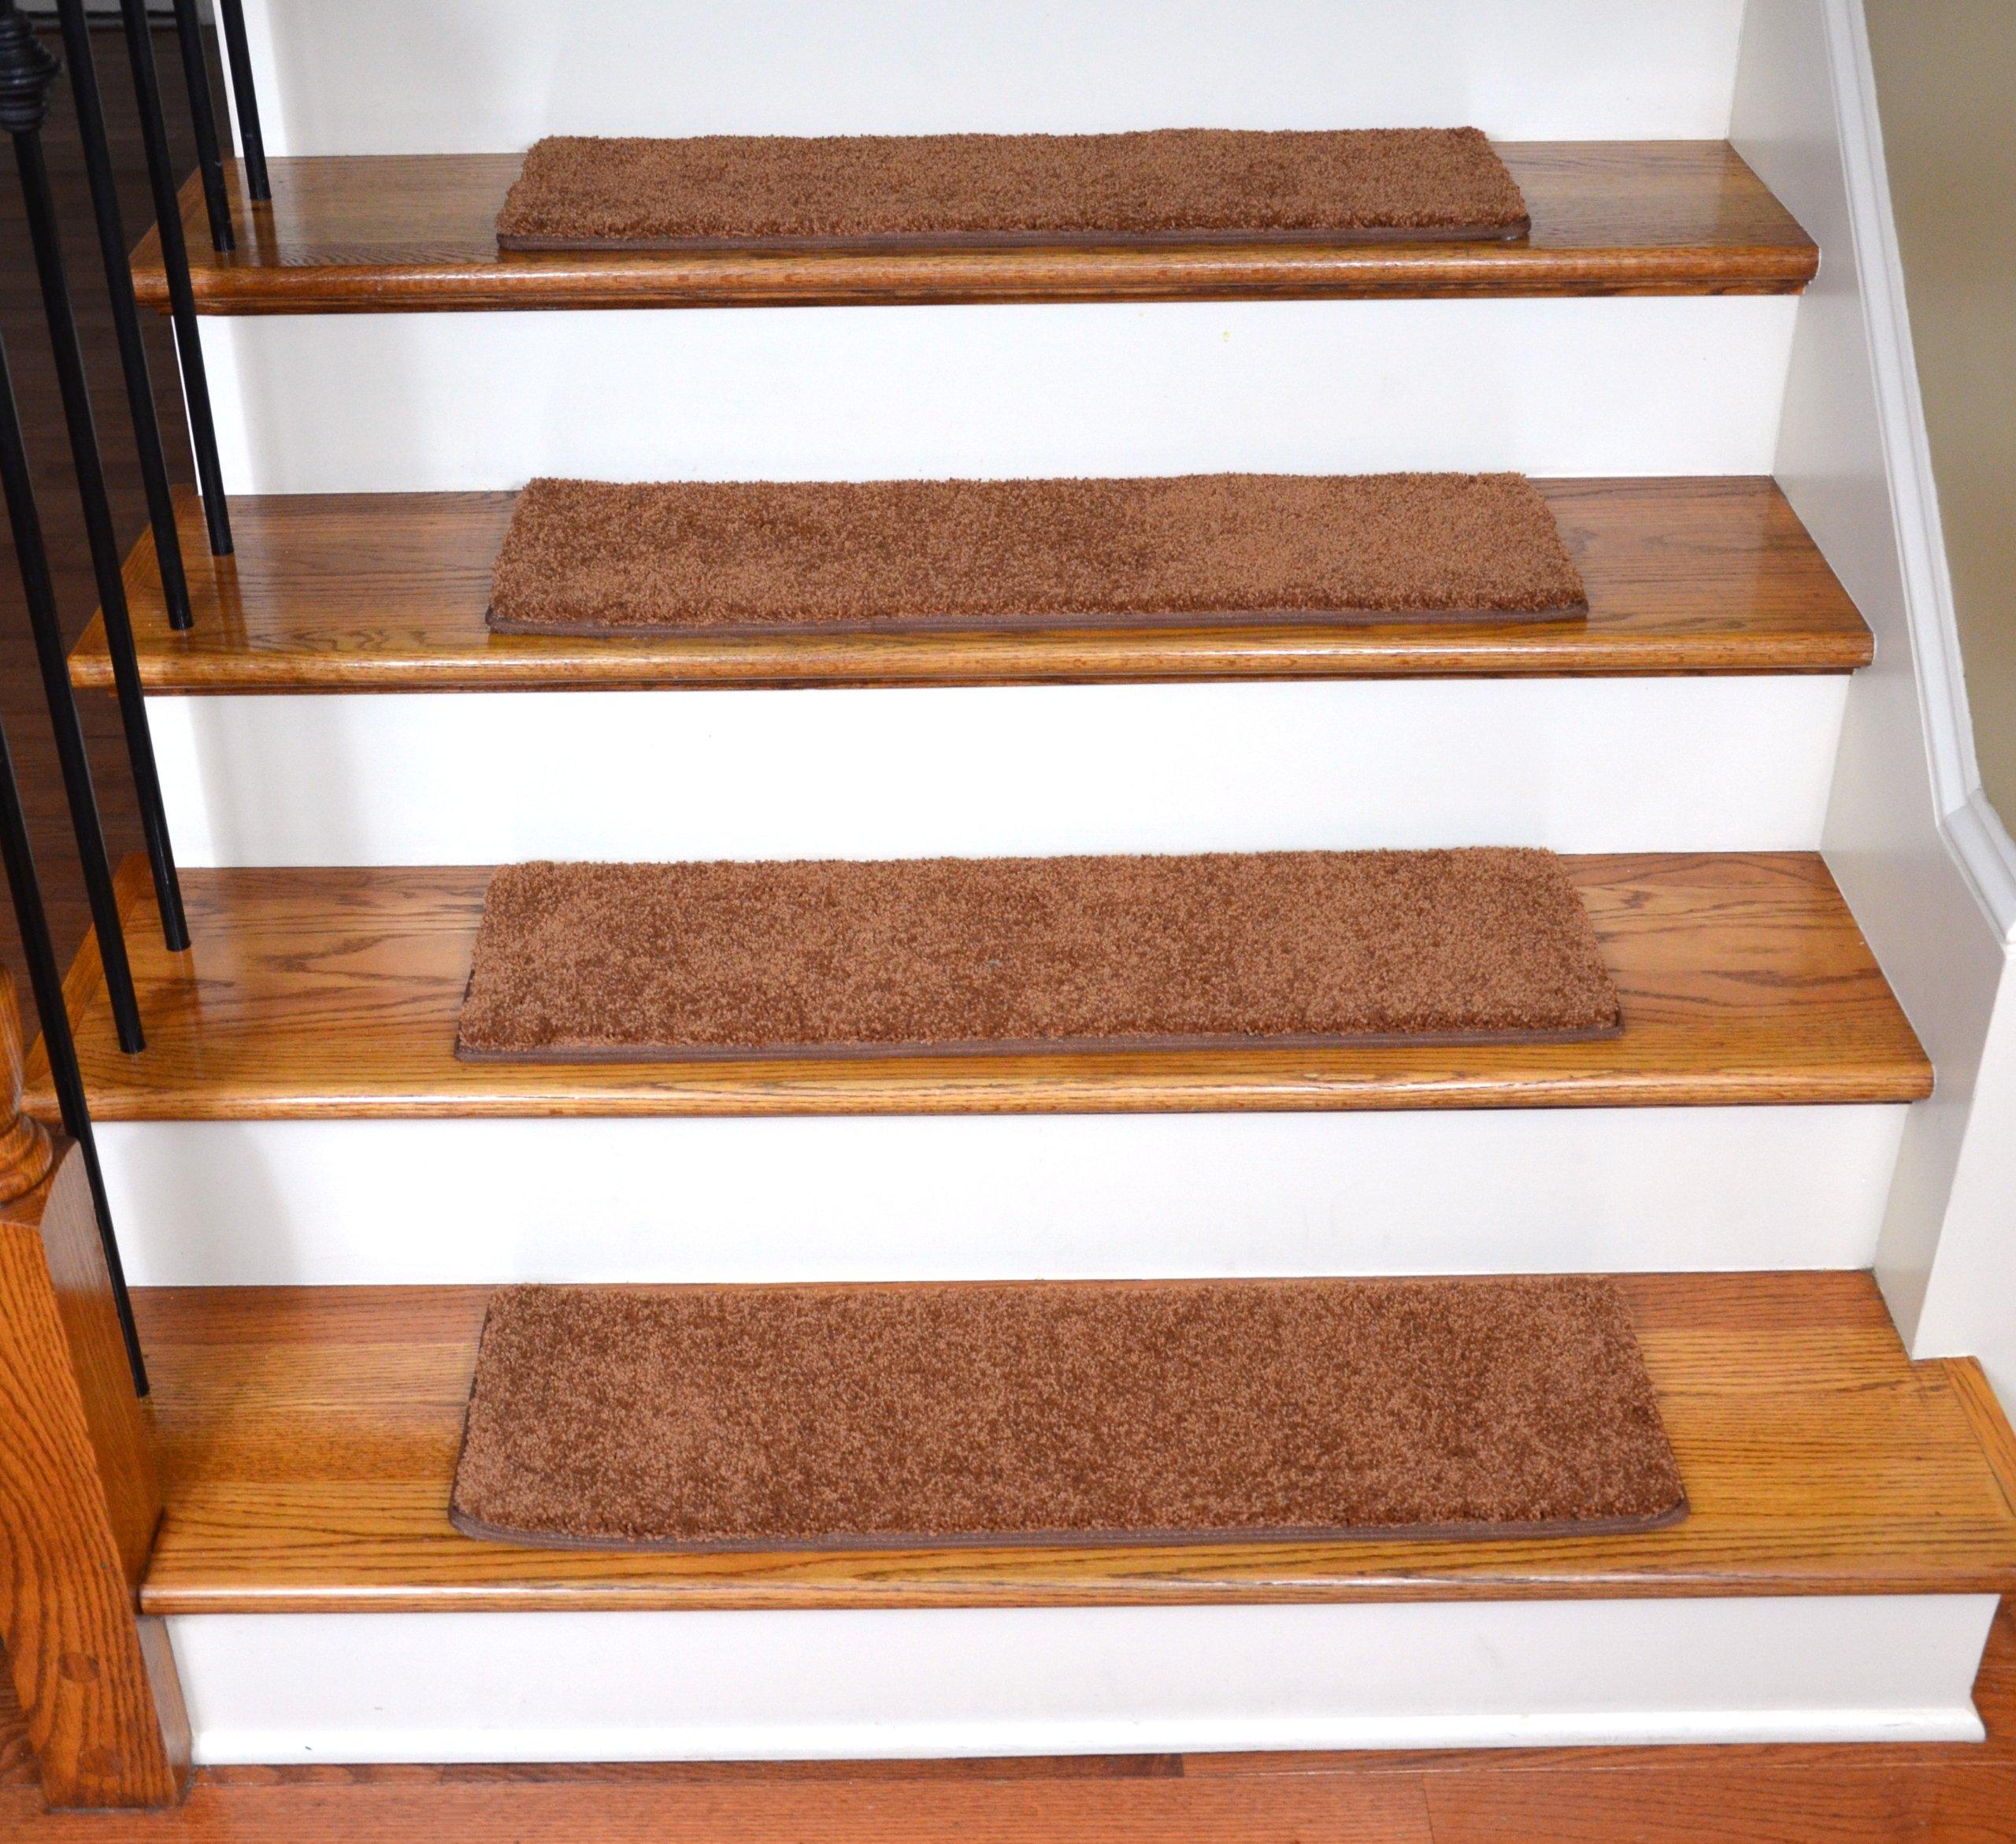 Dean Ultra Premium Stair Gripper Non-Slip Tape Free Pet Friendly DIY Carpet Stair Treads/Rugs 30'' x 9'' (15) - Color: Pumpkin Spice